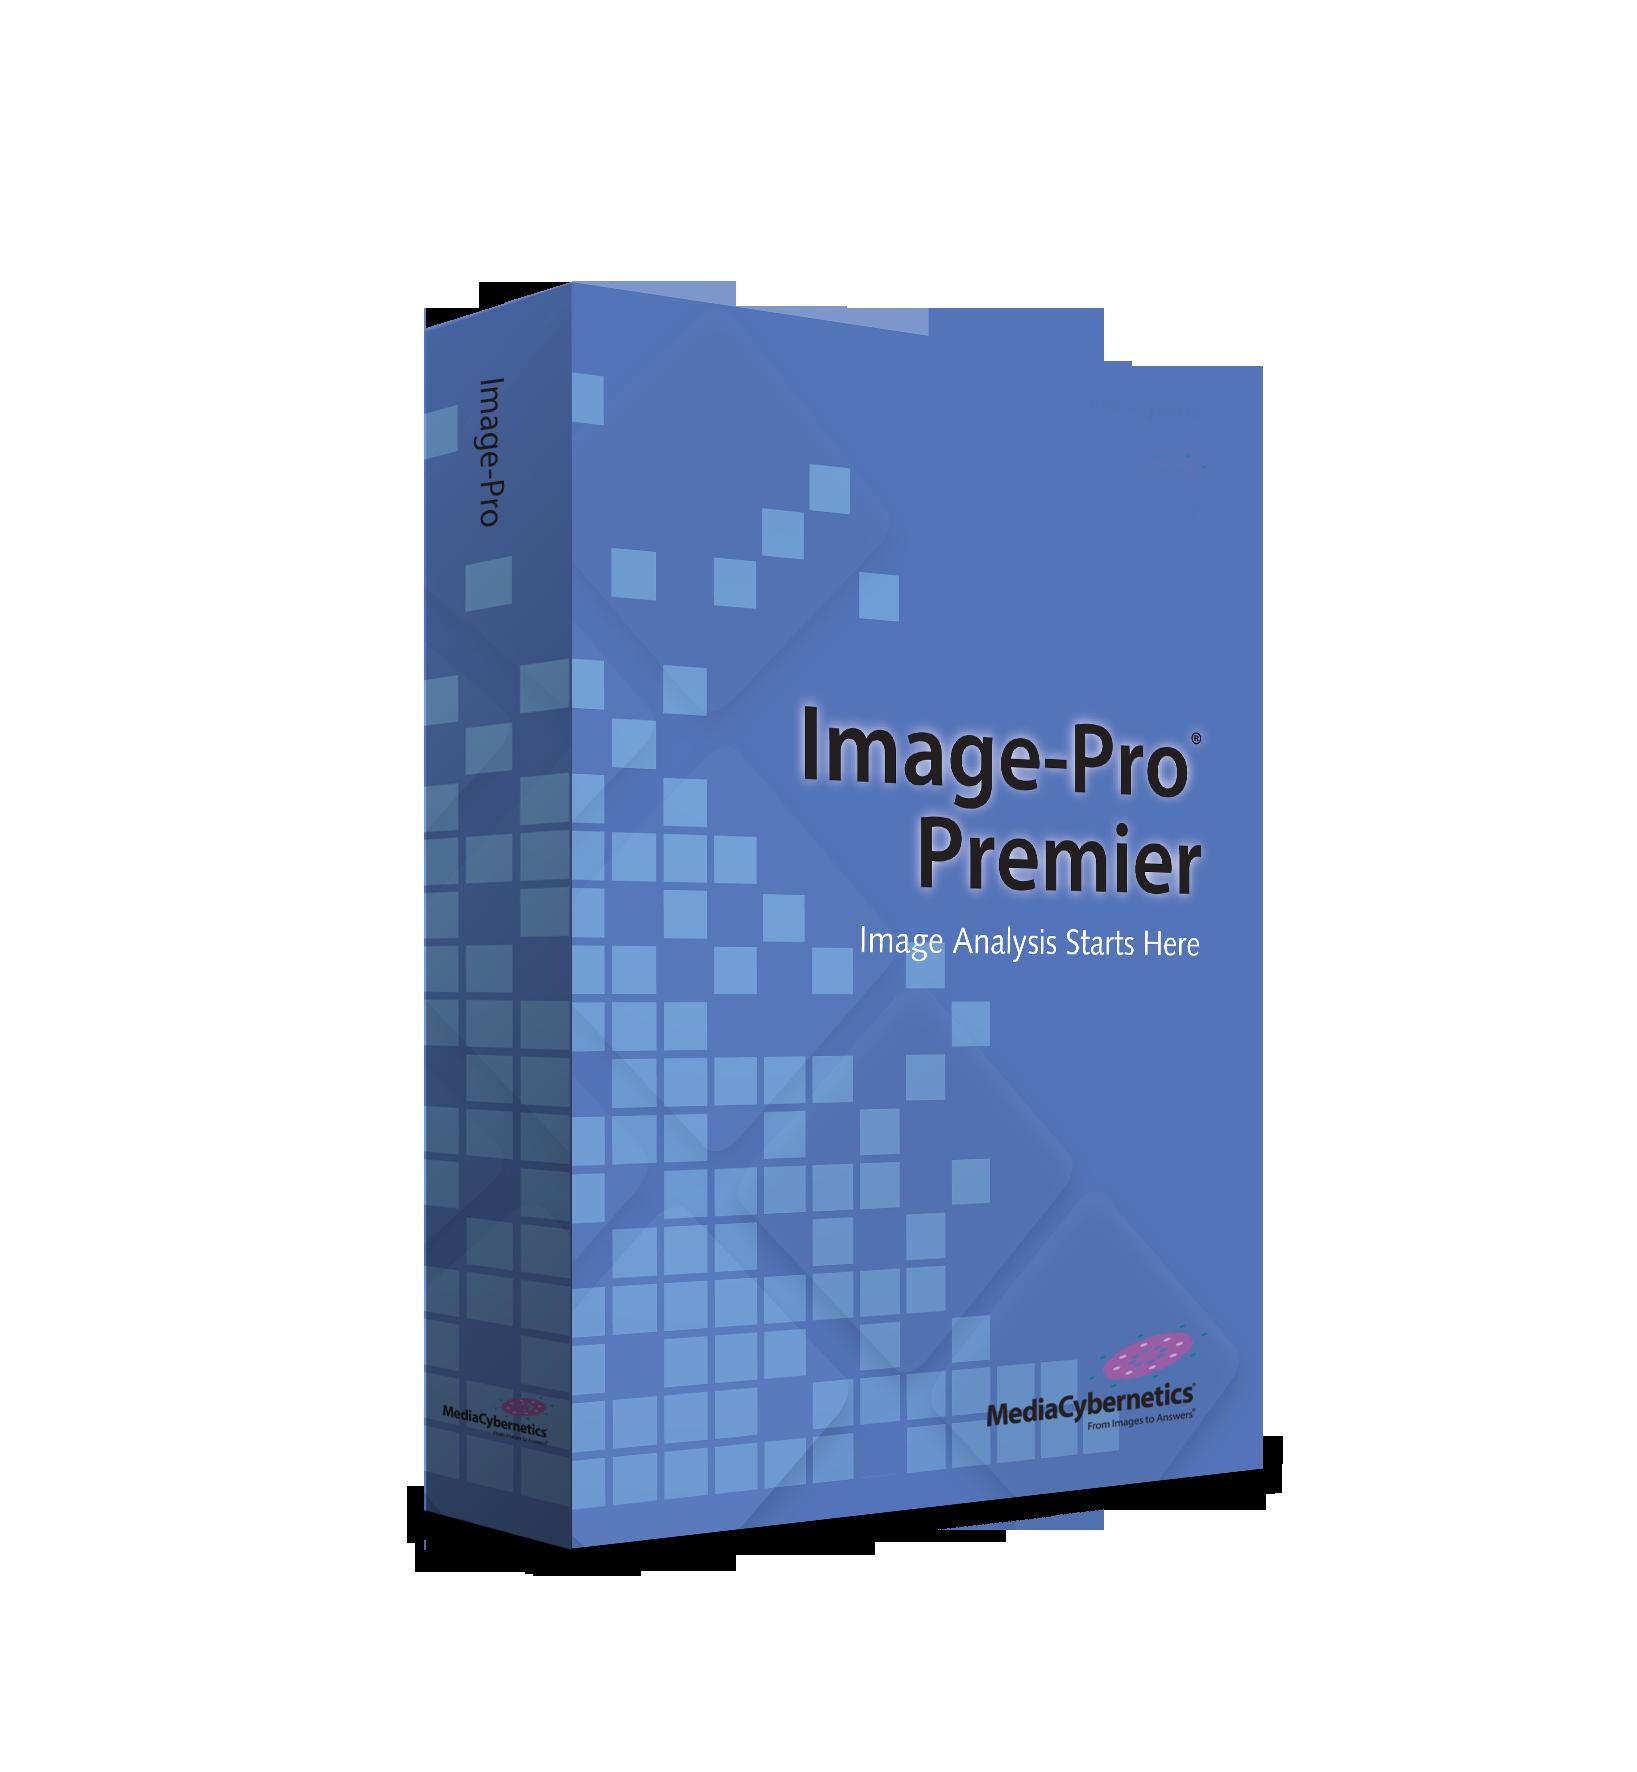 Image-Pro Premier Image Analysis Software